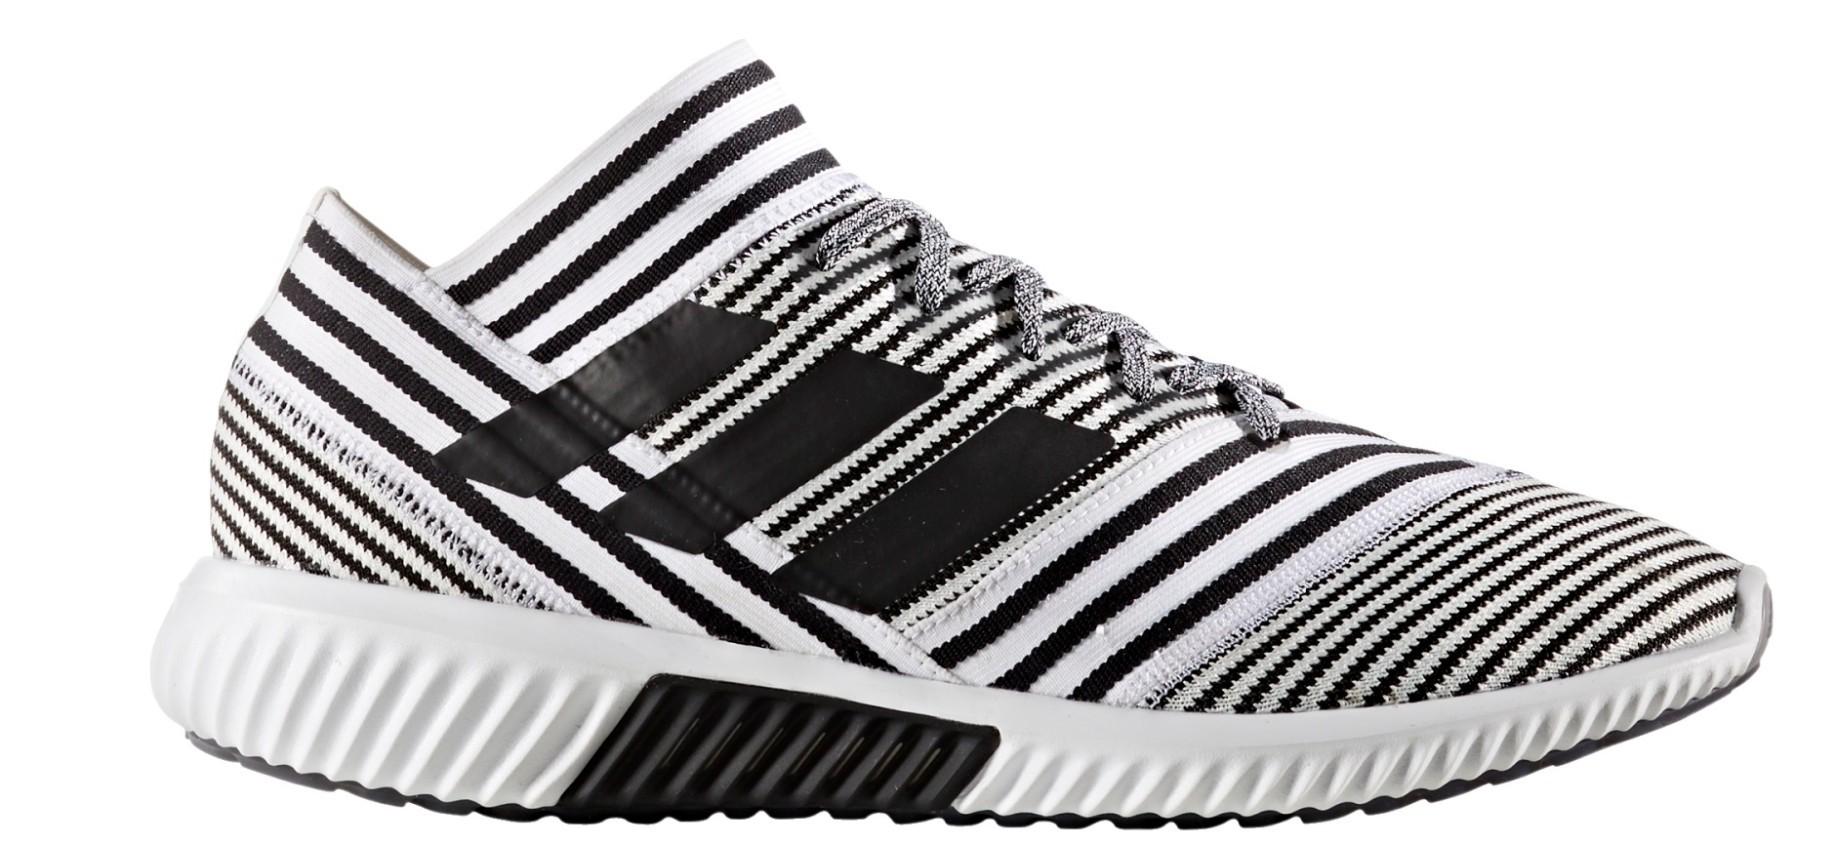 9177f2f8b4af Shoes Soccer Adidas Nemeziz Tango 17.1 TR Dust Storm Pack colore White -  Adidas - SportIT.com